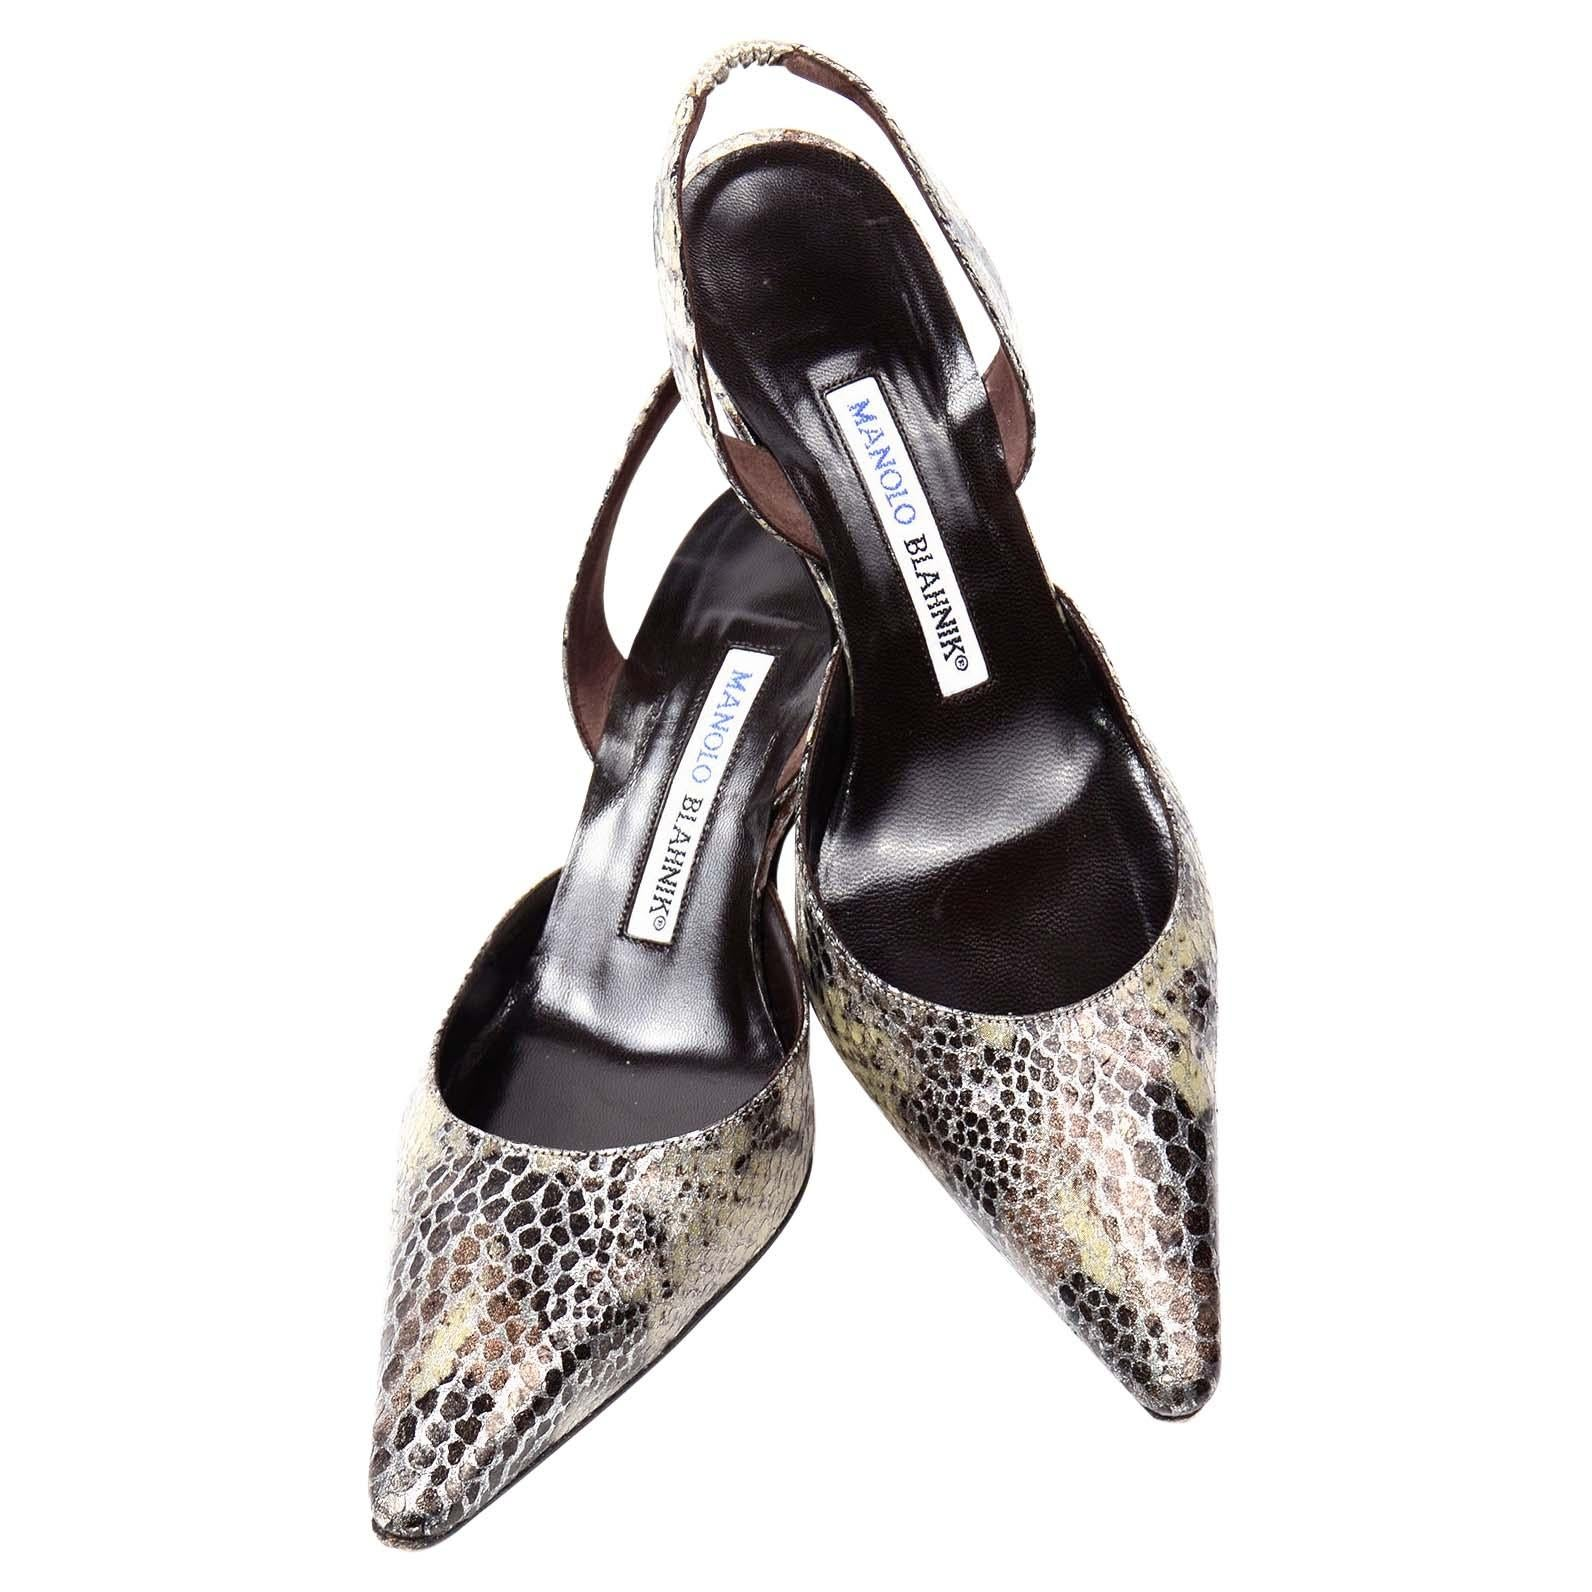 Manolo Blahnik Pointed Toe Snakeskin Pattern Slingback Shoes